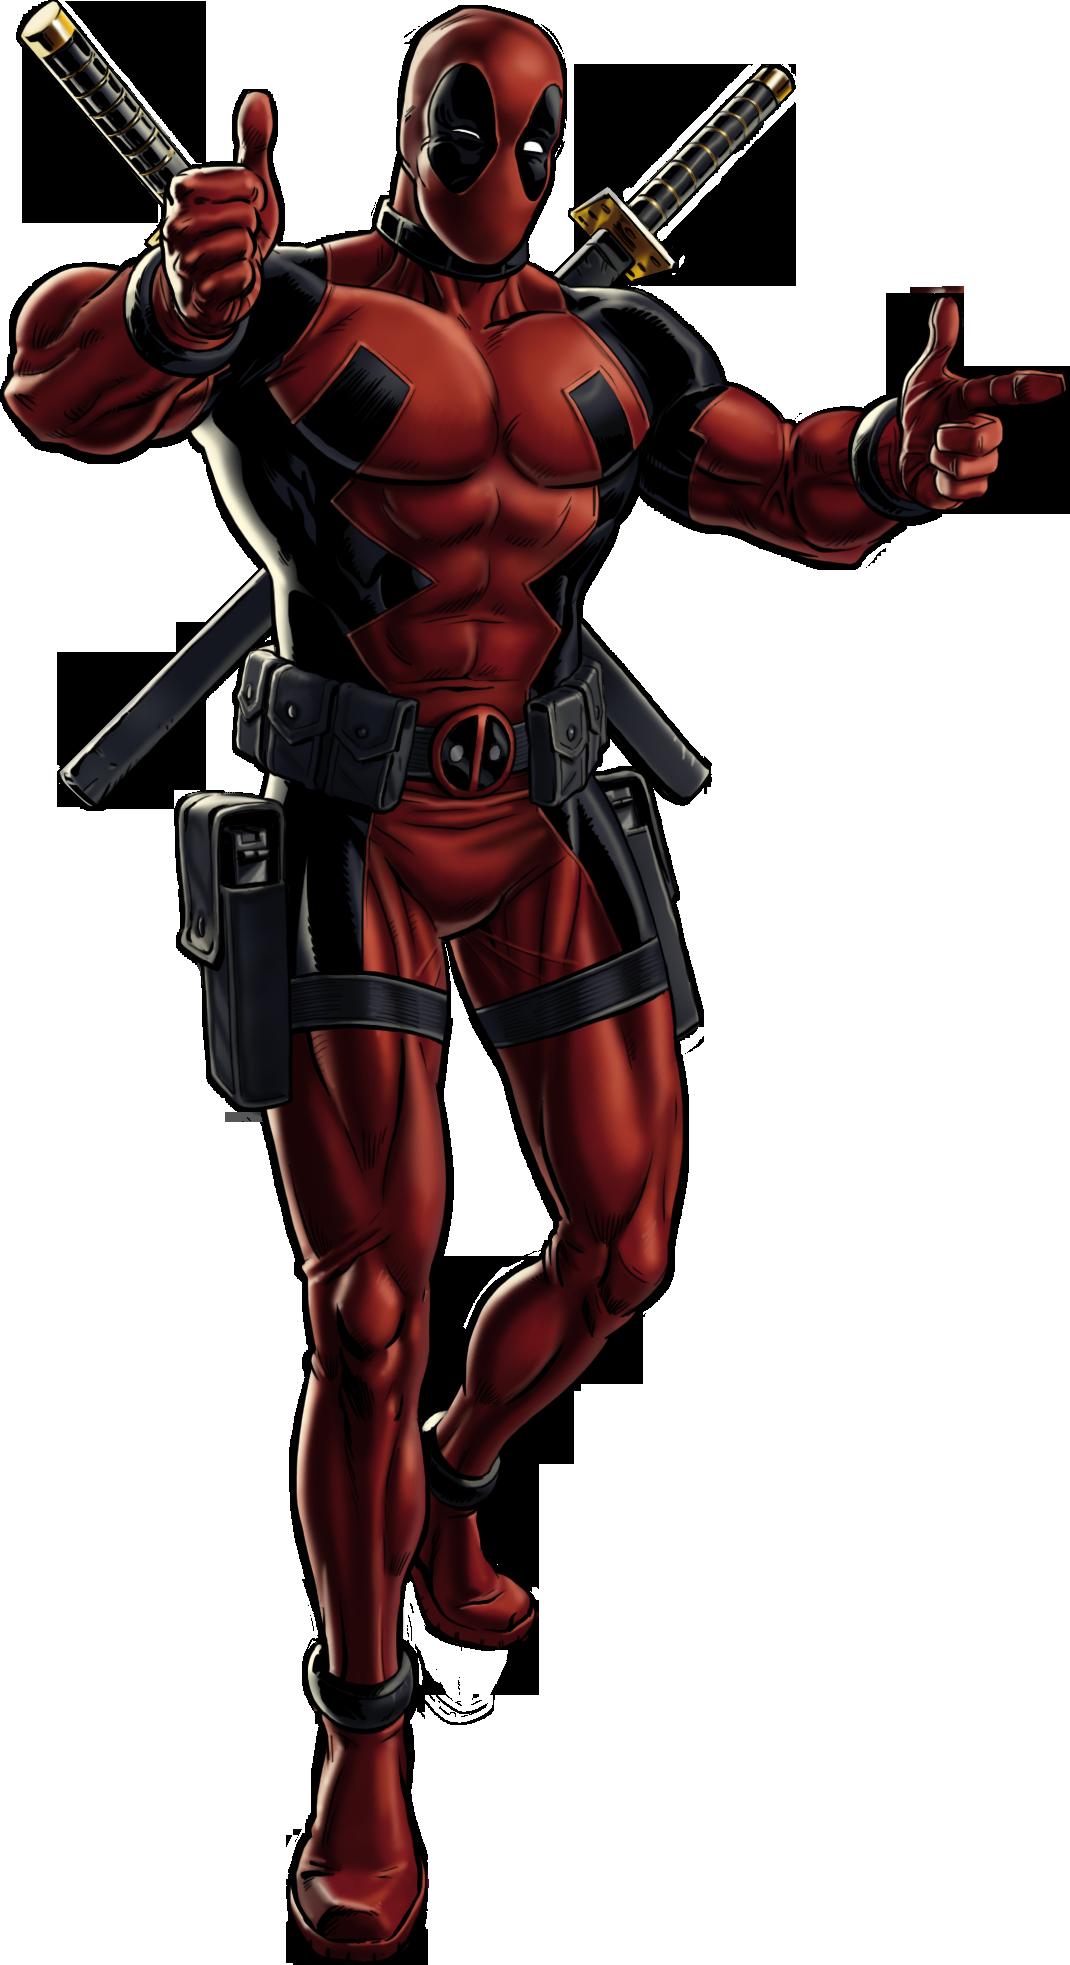 Image - Deadpool Portrait Art.png | Marvel: Avengers Alliance Wiki | FANDOM  powered by Wikia - Marvel PNG